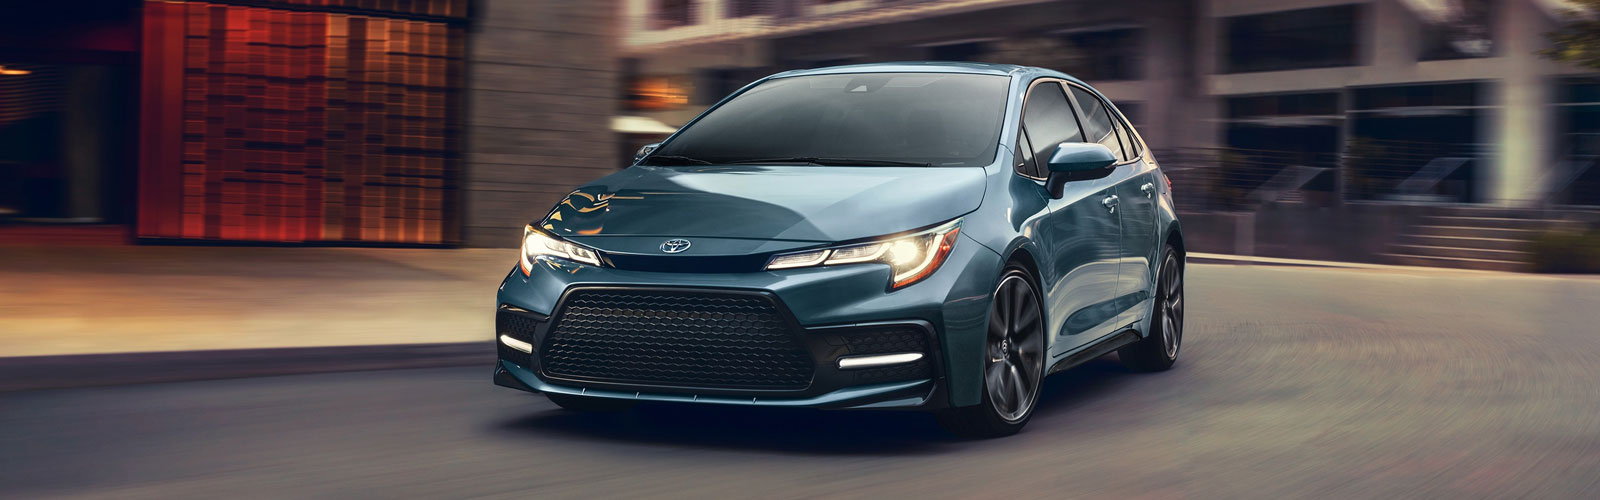 2020 Toyota Corolla Sedan Models For Sale In Grenada, Mississippi